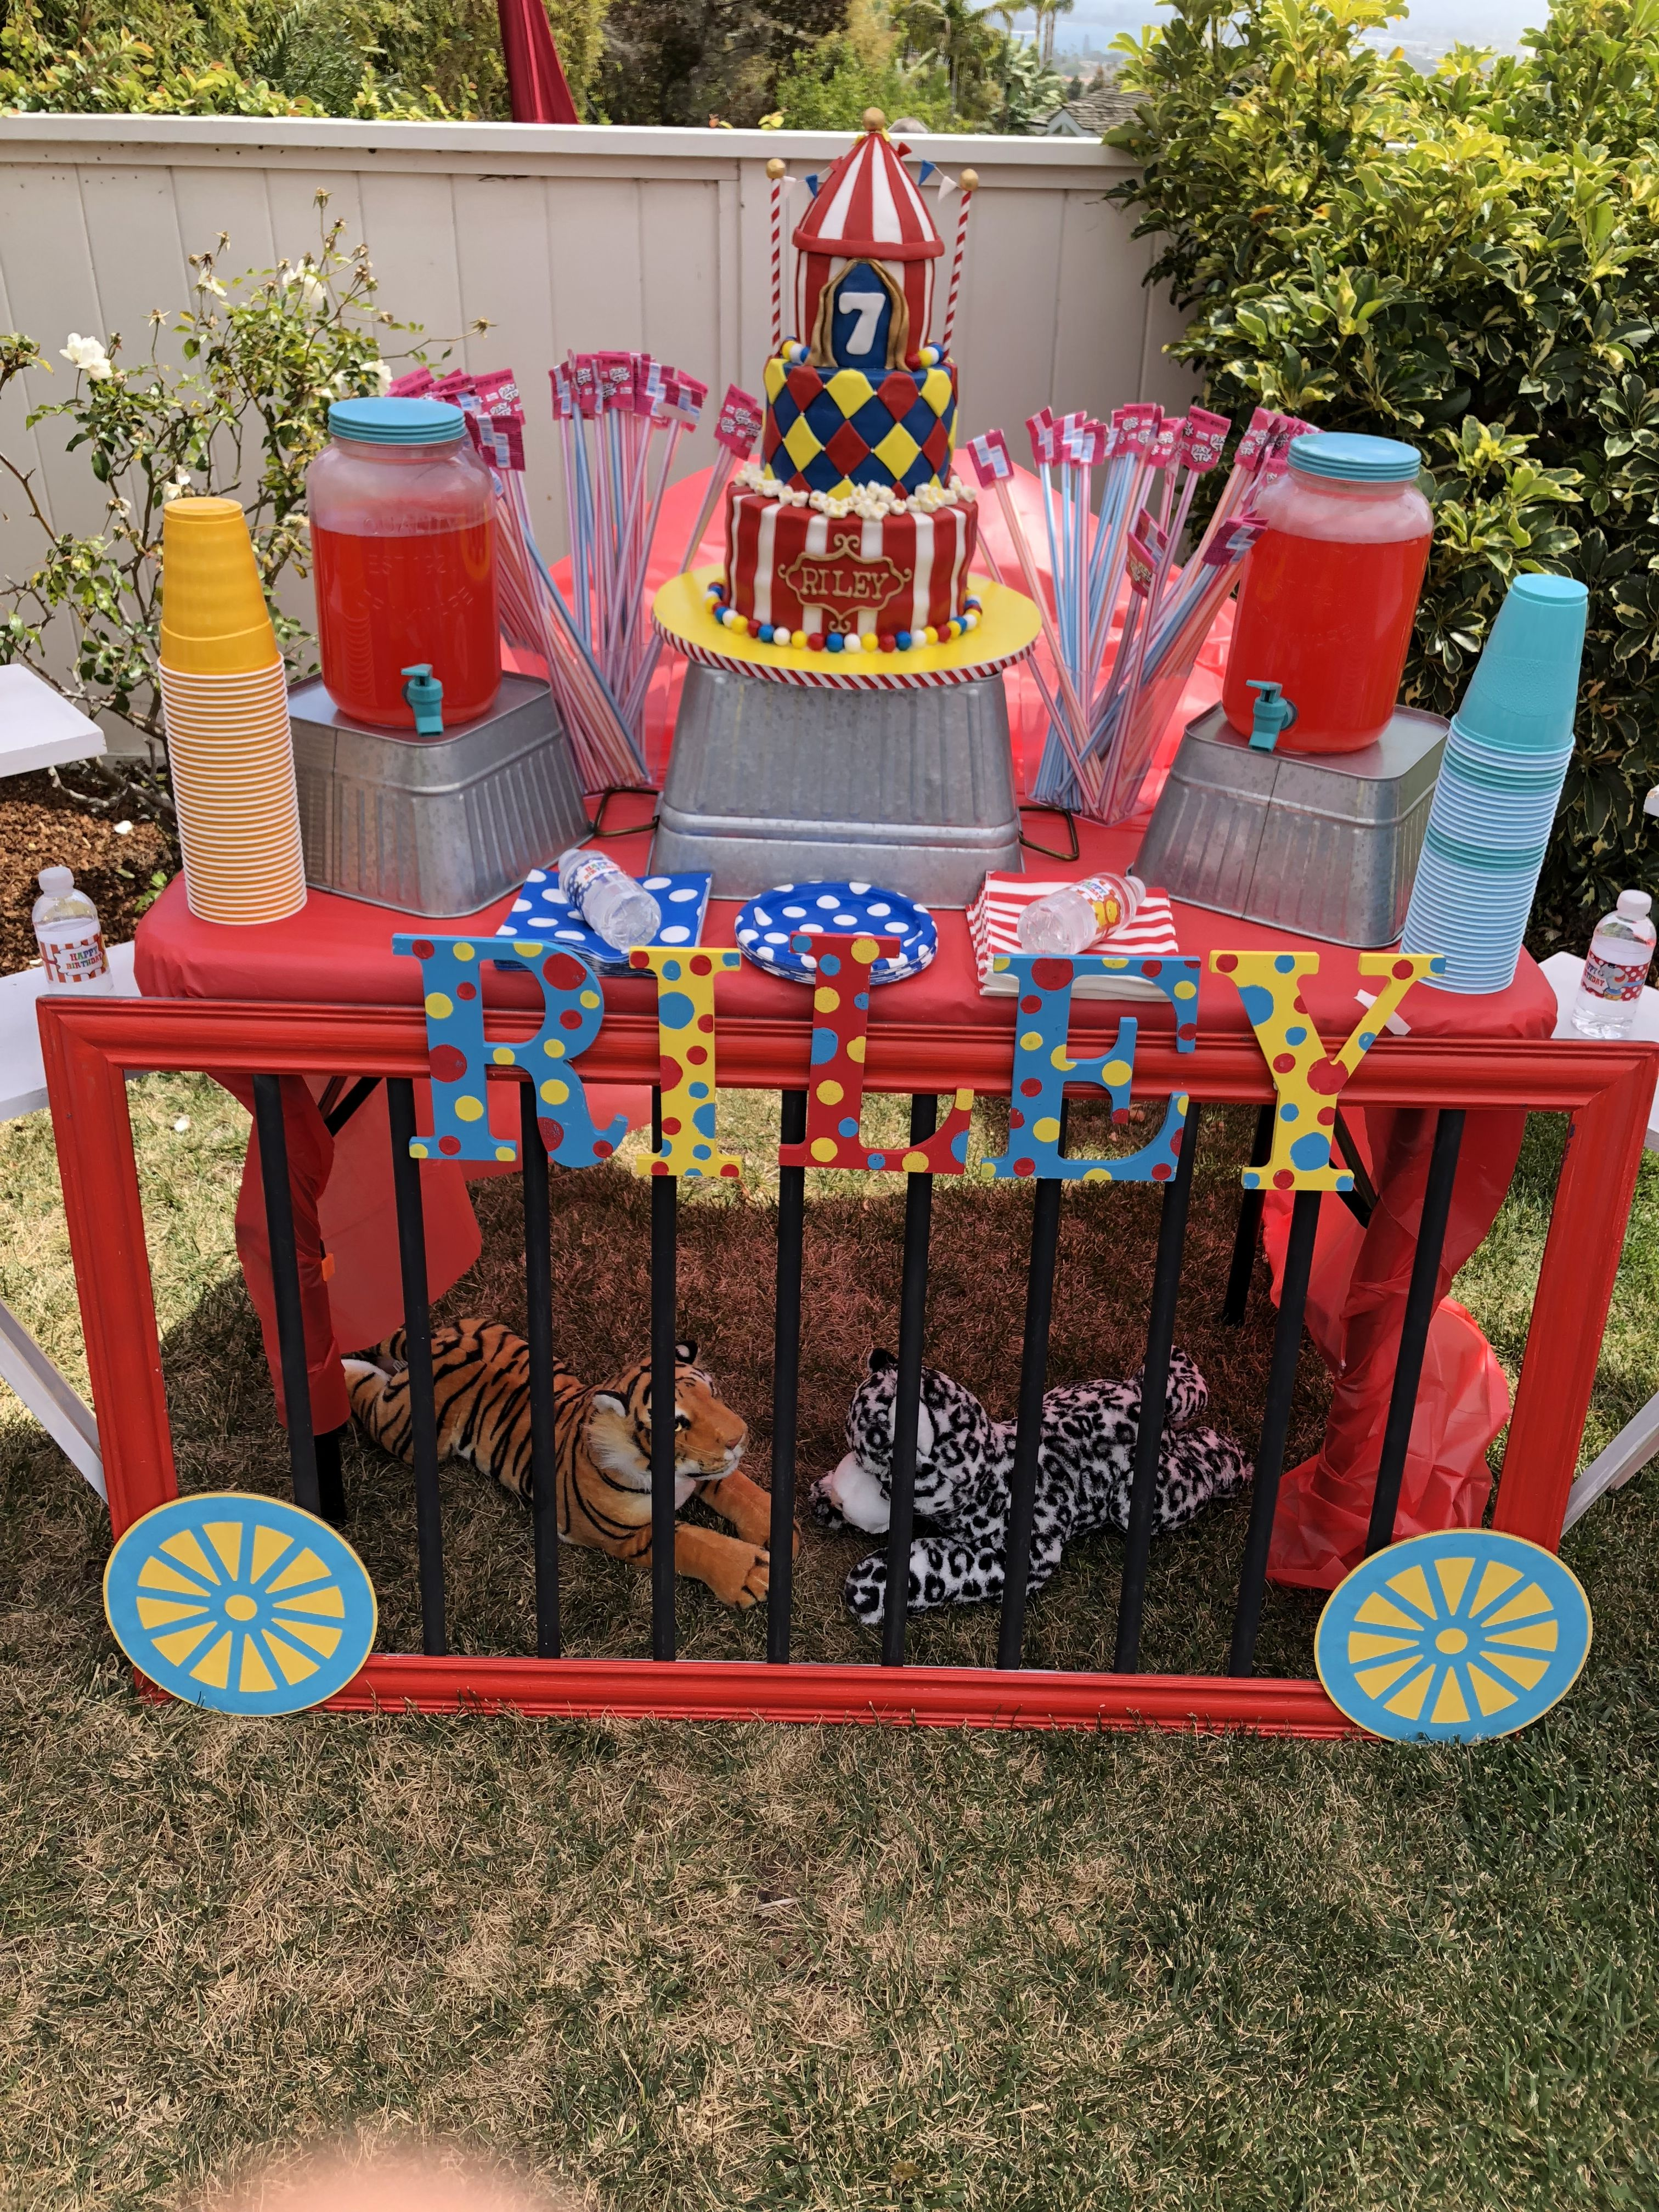 La Jaula De Animales Salvajes Bajo La Mesa De La Merienda Da Un Toque Gracioso Circus Birthday Party Theme Dumbo Birthday Party Carnival Birthday Party Theme